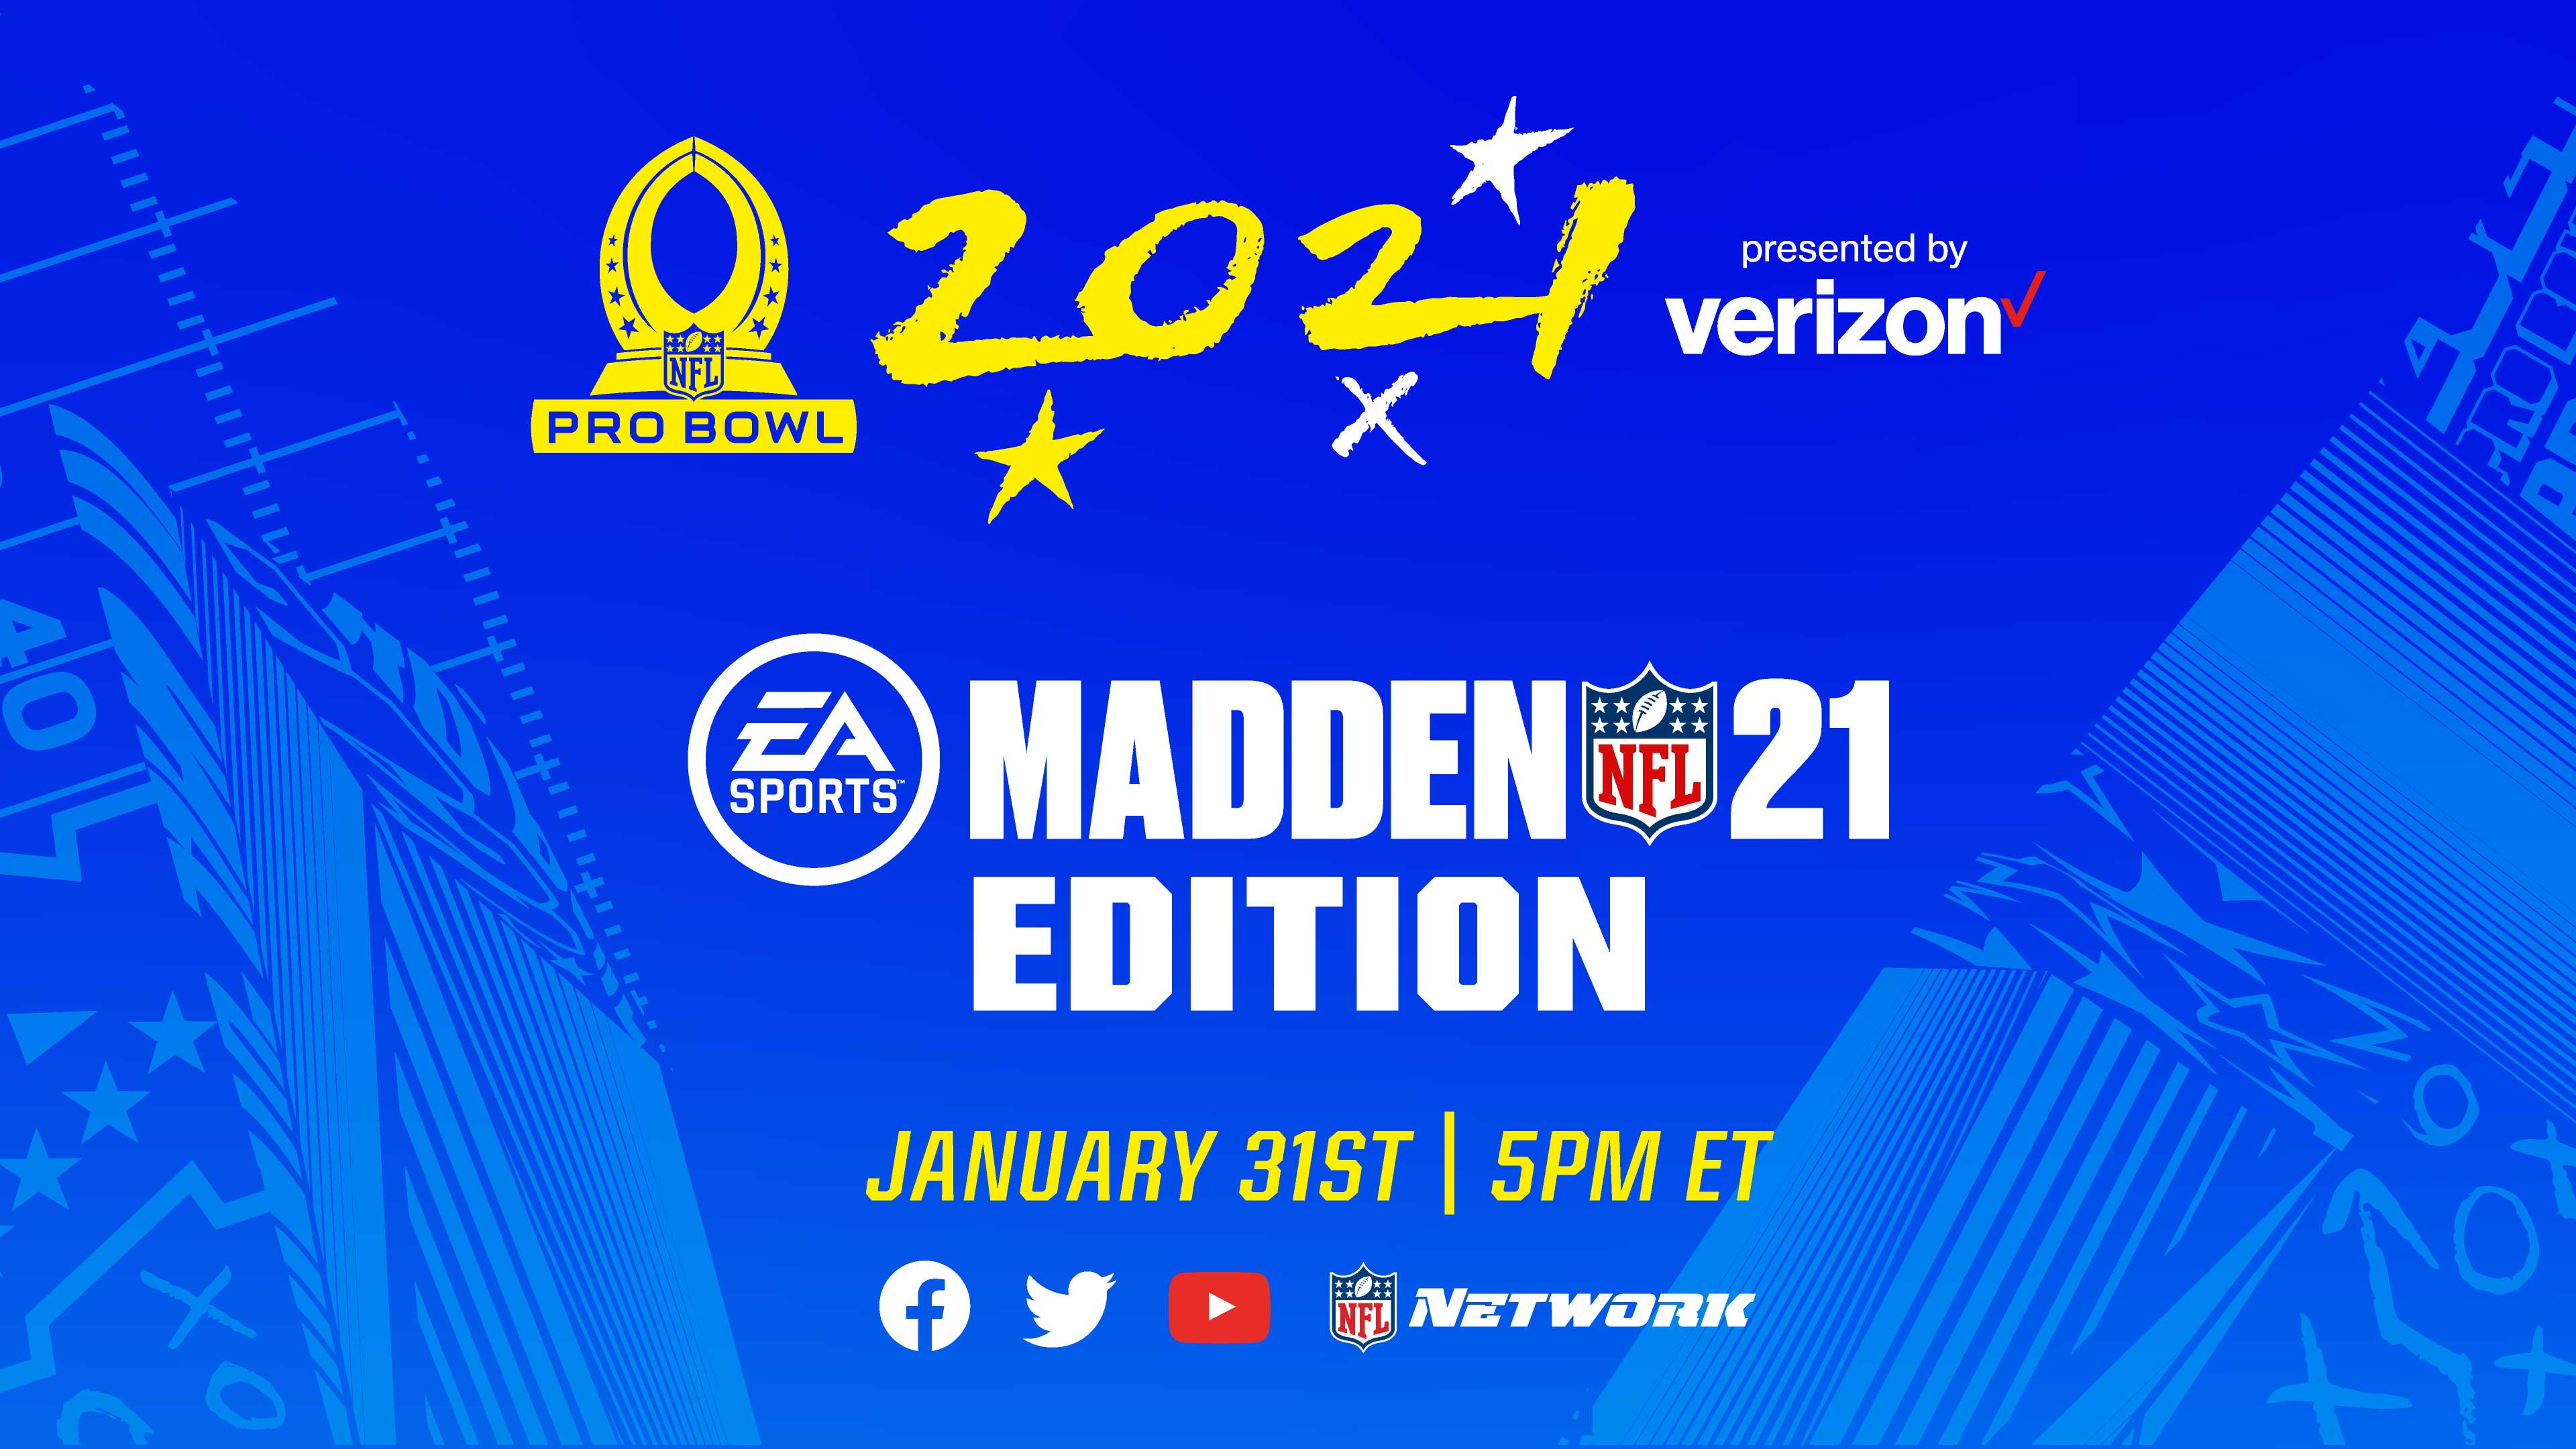 EA Madden x 2021 Pro Bowl presented by Verizon